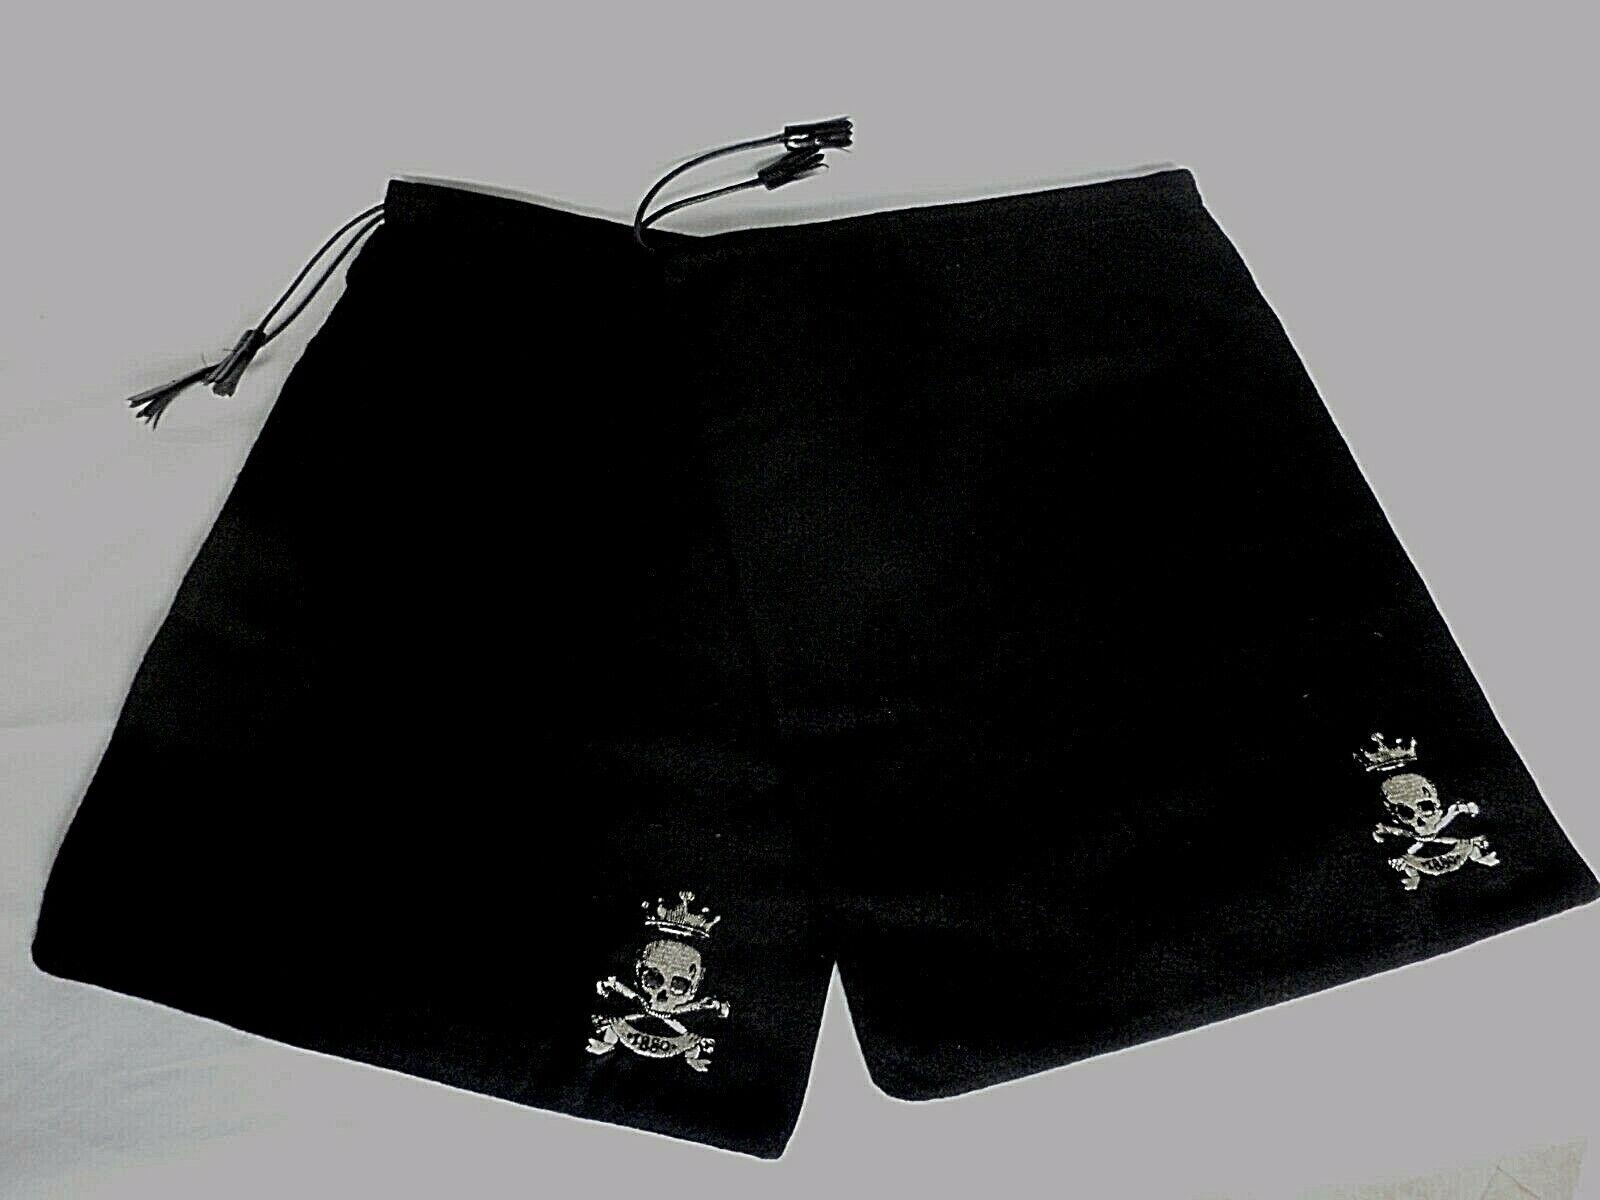 Barker Black Collection Cotton BOOT Pair Of Dustbag Sleeper Bag SKULL & X BONES